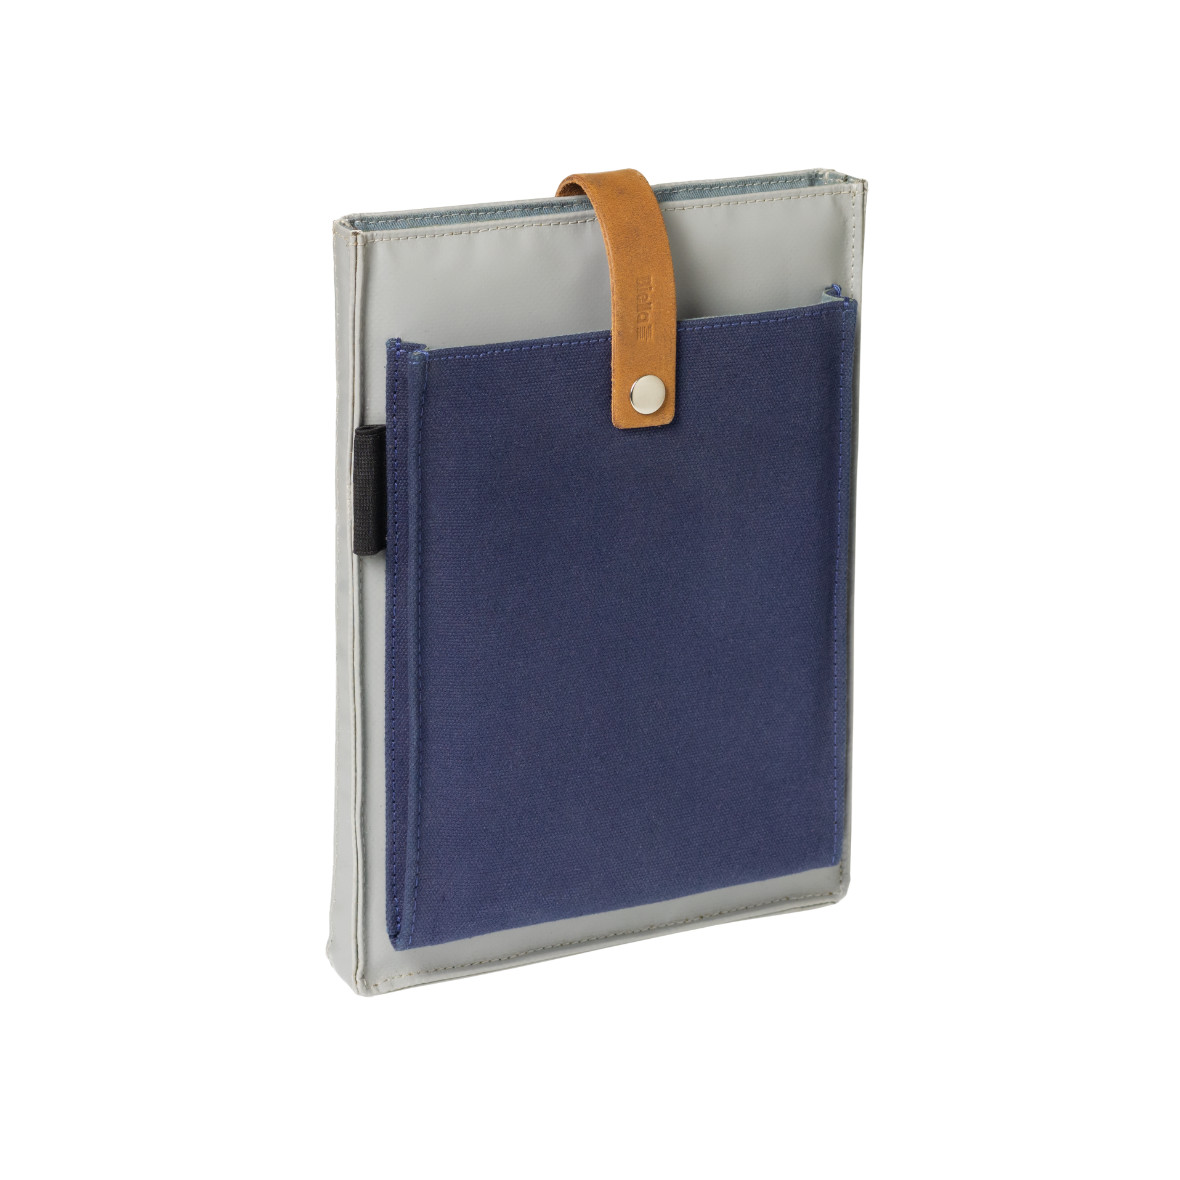 collection bundesordner tablet sleeve biella1